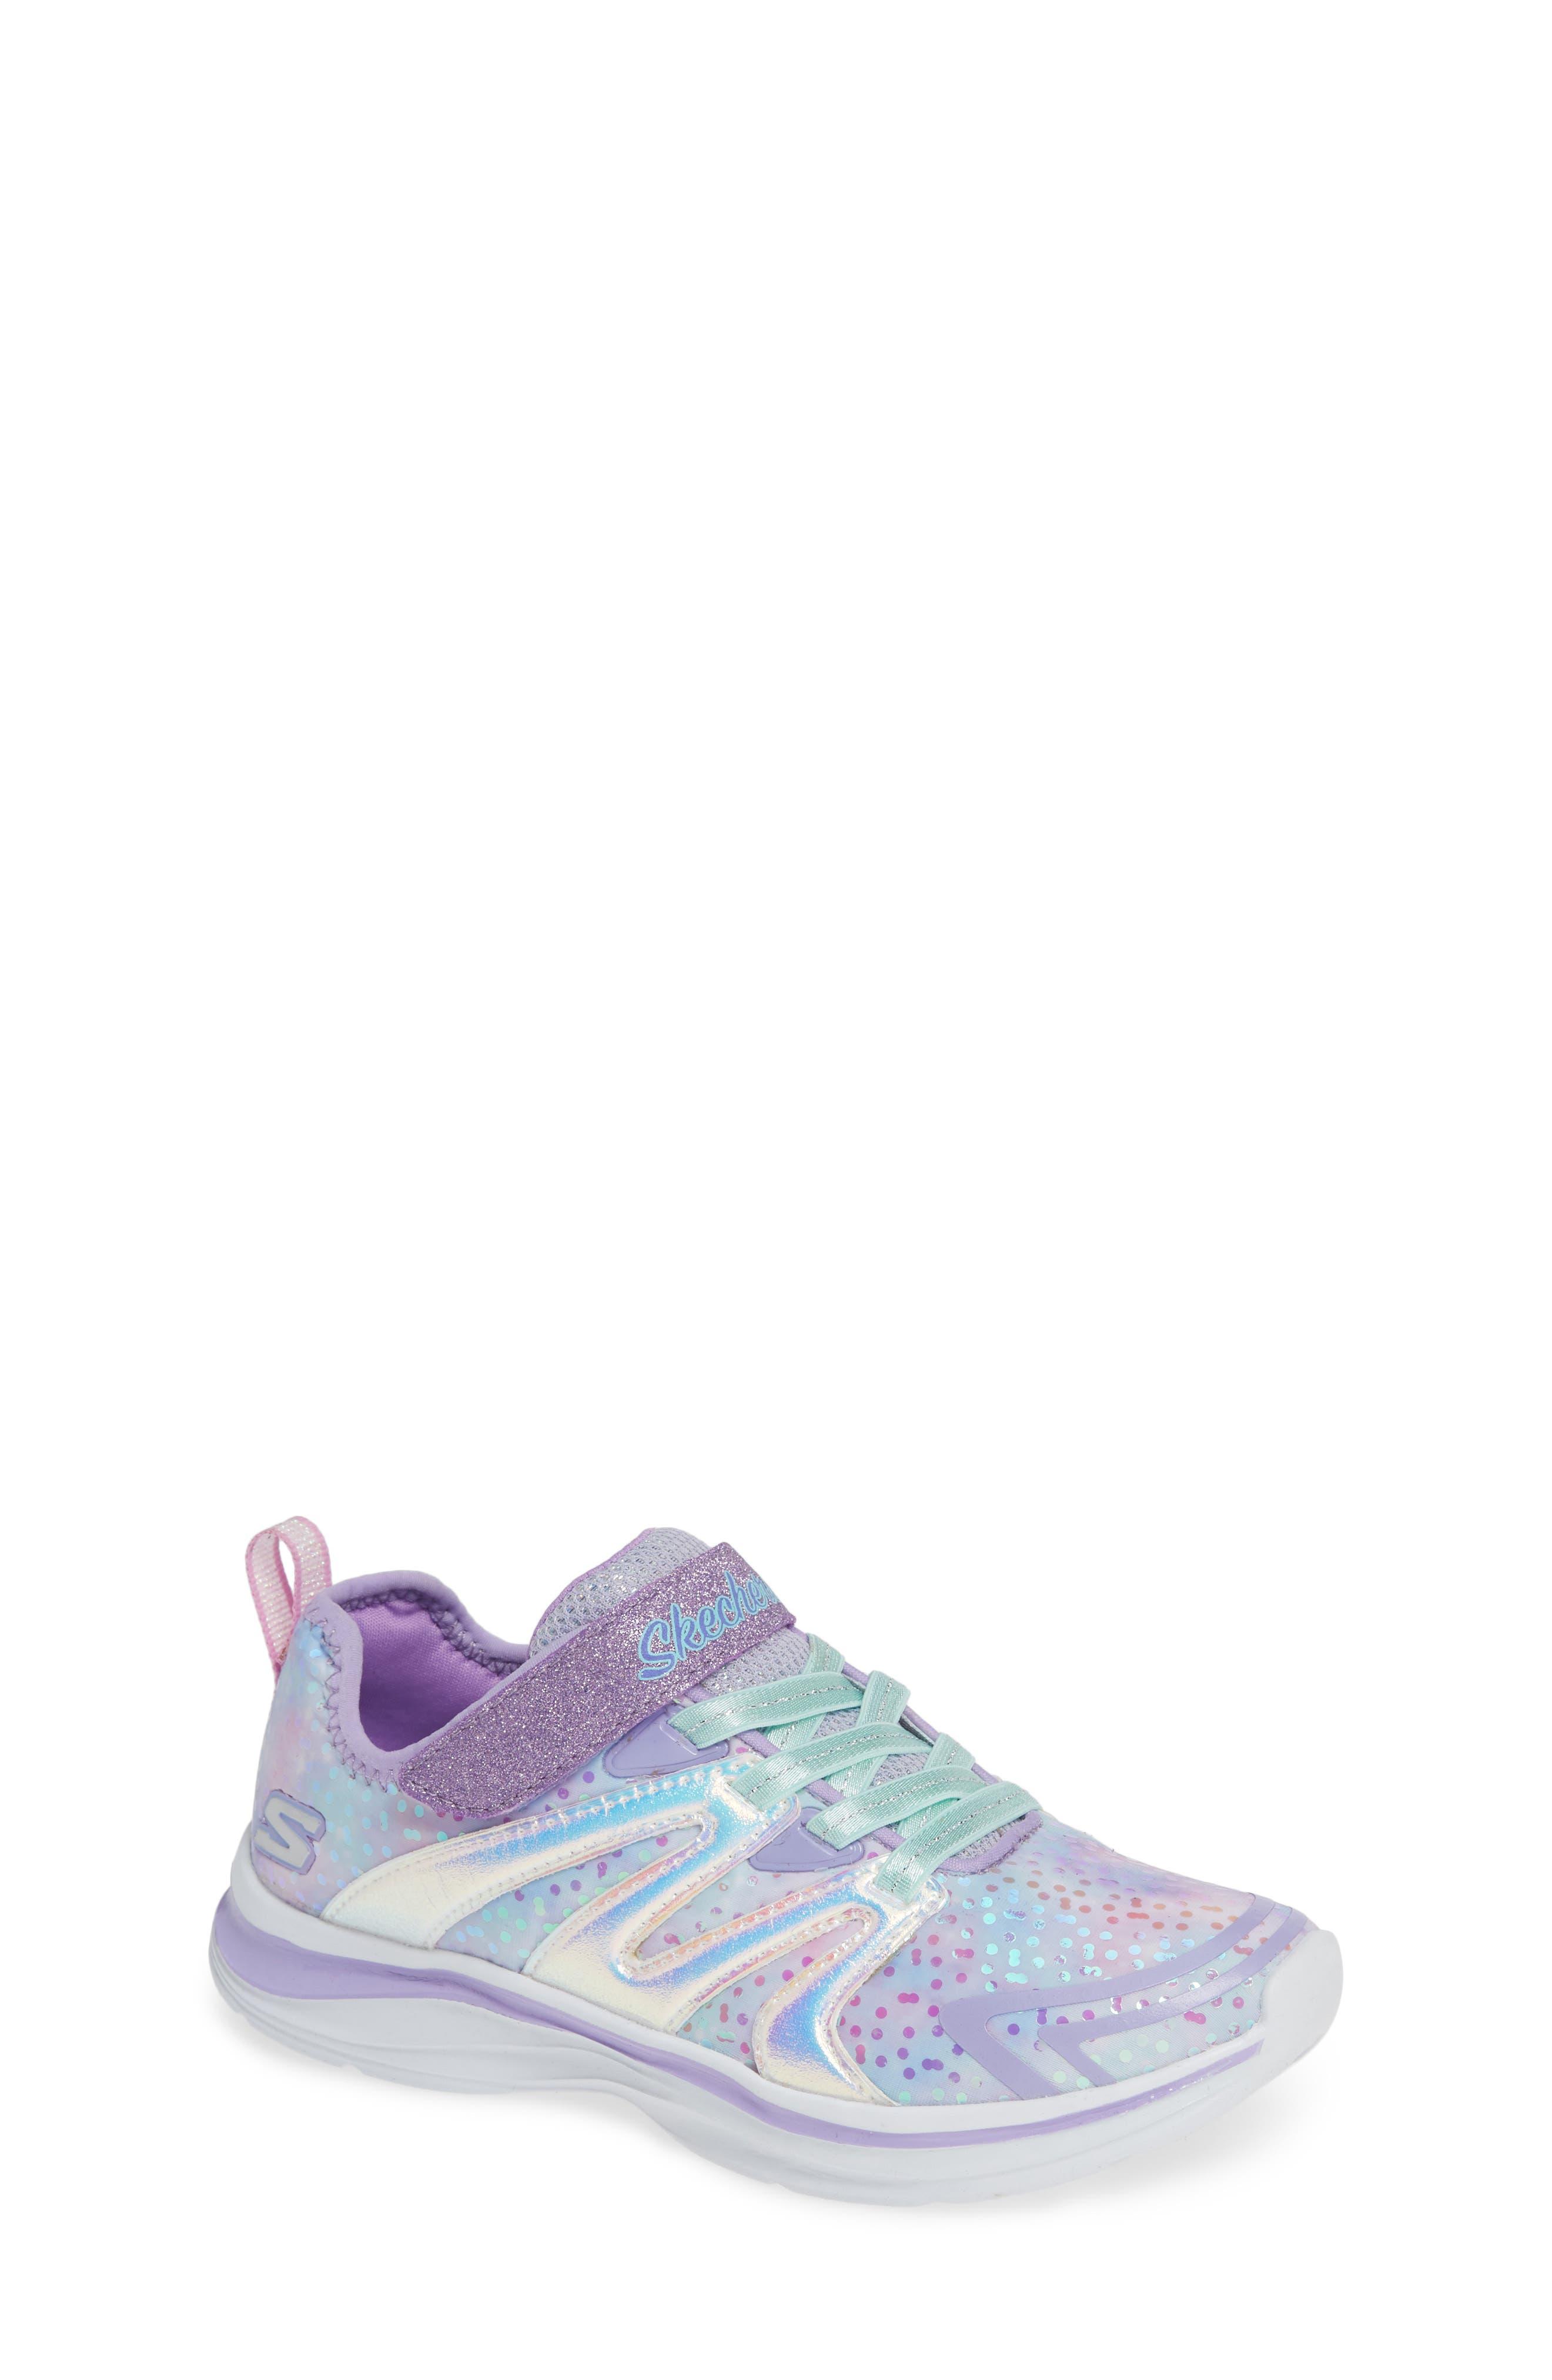 Double Dreams Shimmer Sneaker,                         Main,                         color, LAVENDER/ MULTI